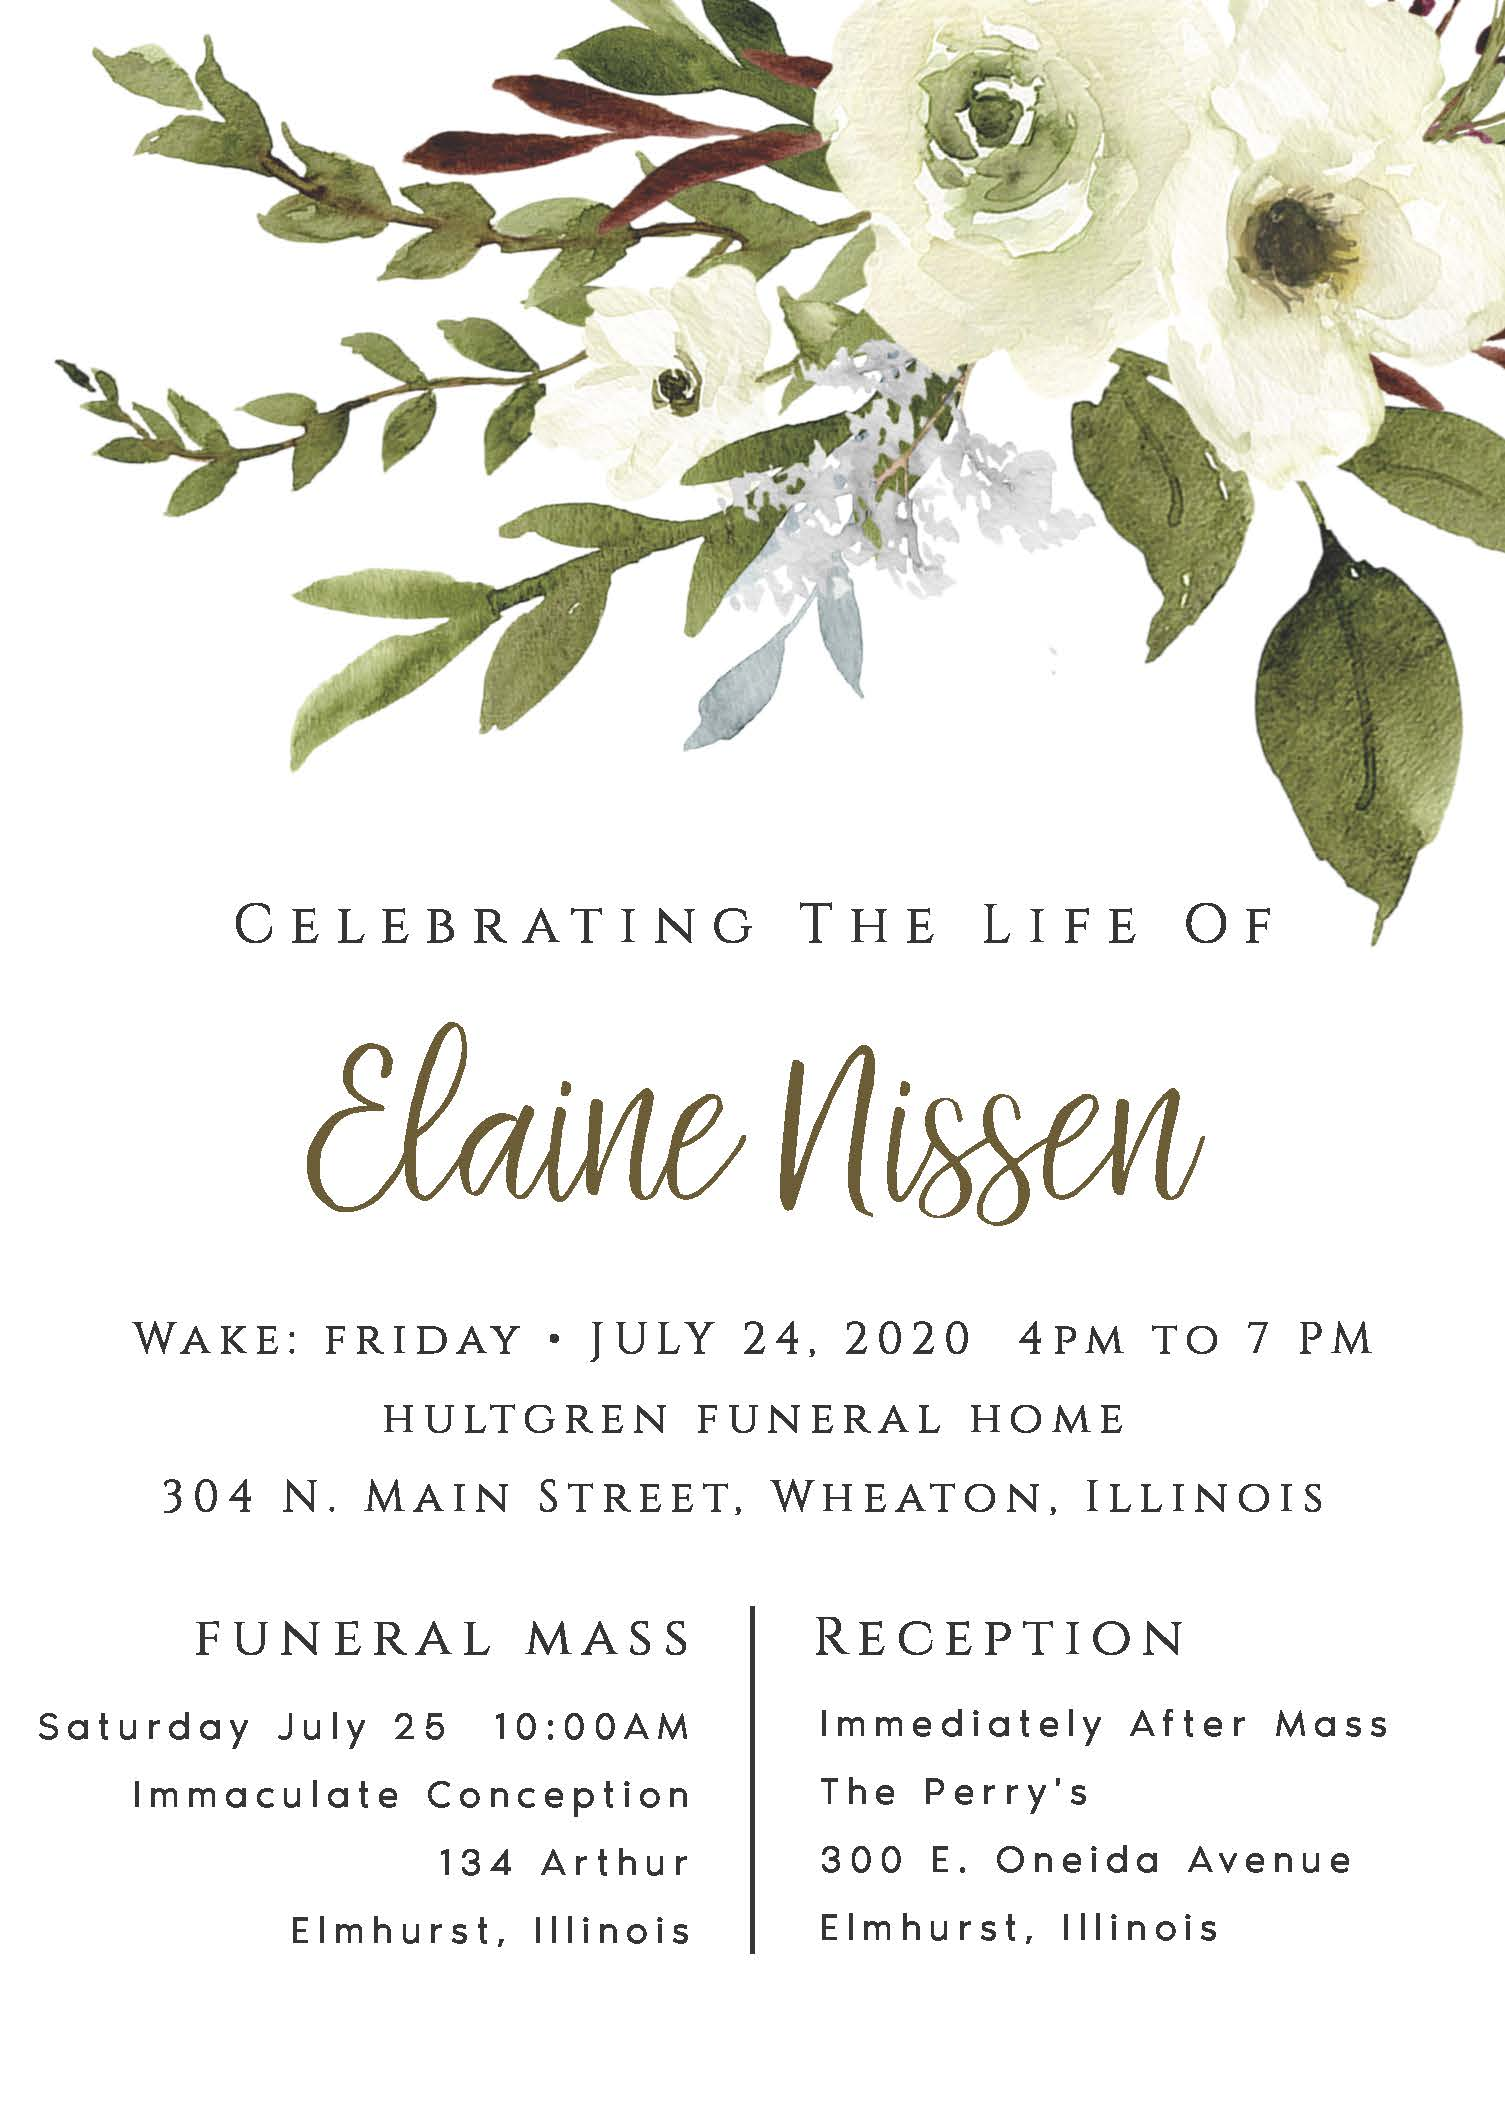 Elaine Nissen Funeral Mass Invitation